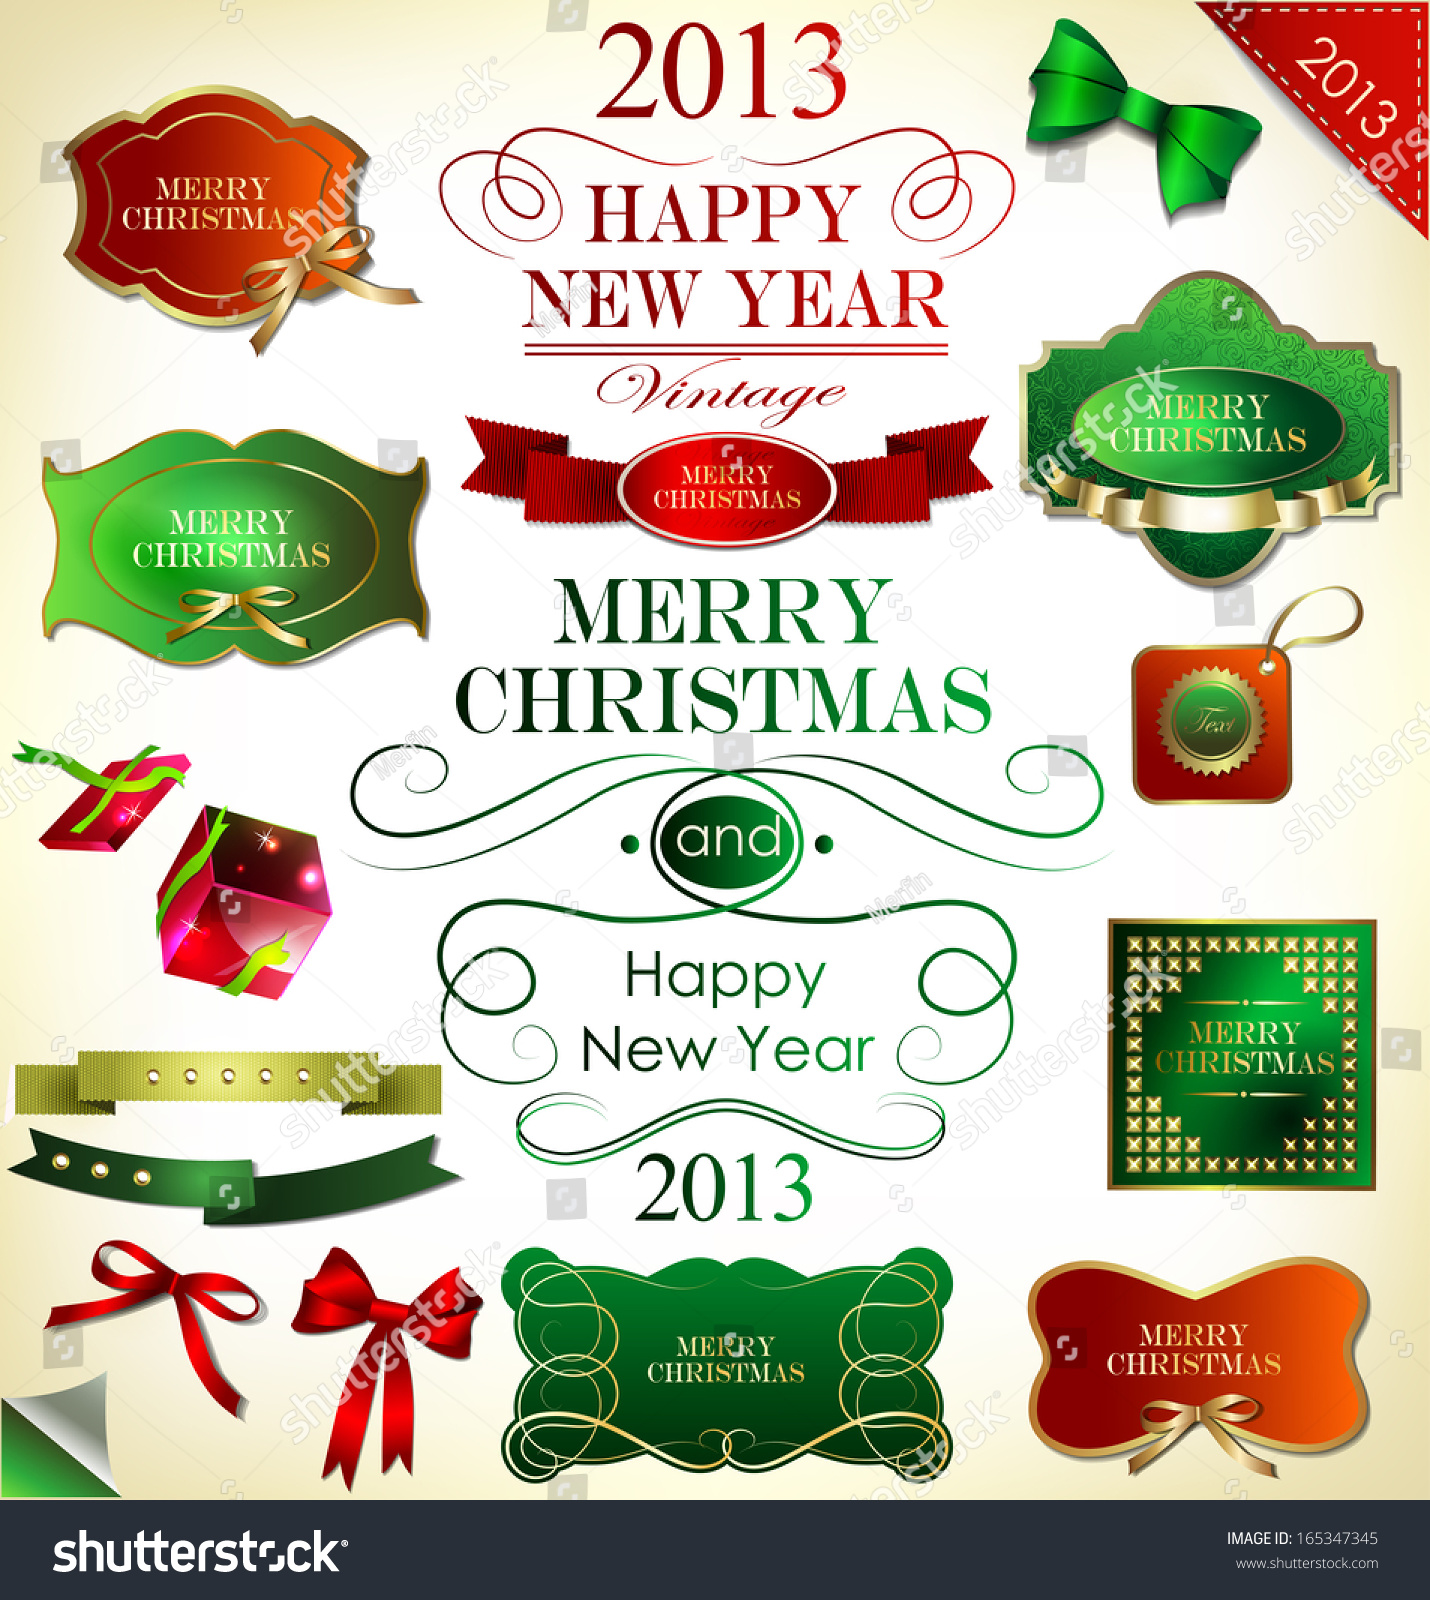 Christmas Tree Decoration Elements: Christmas Decoration Collectionchristmas Tree Calligraphic